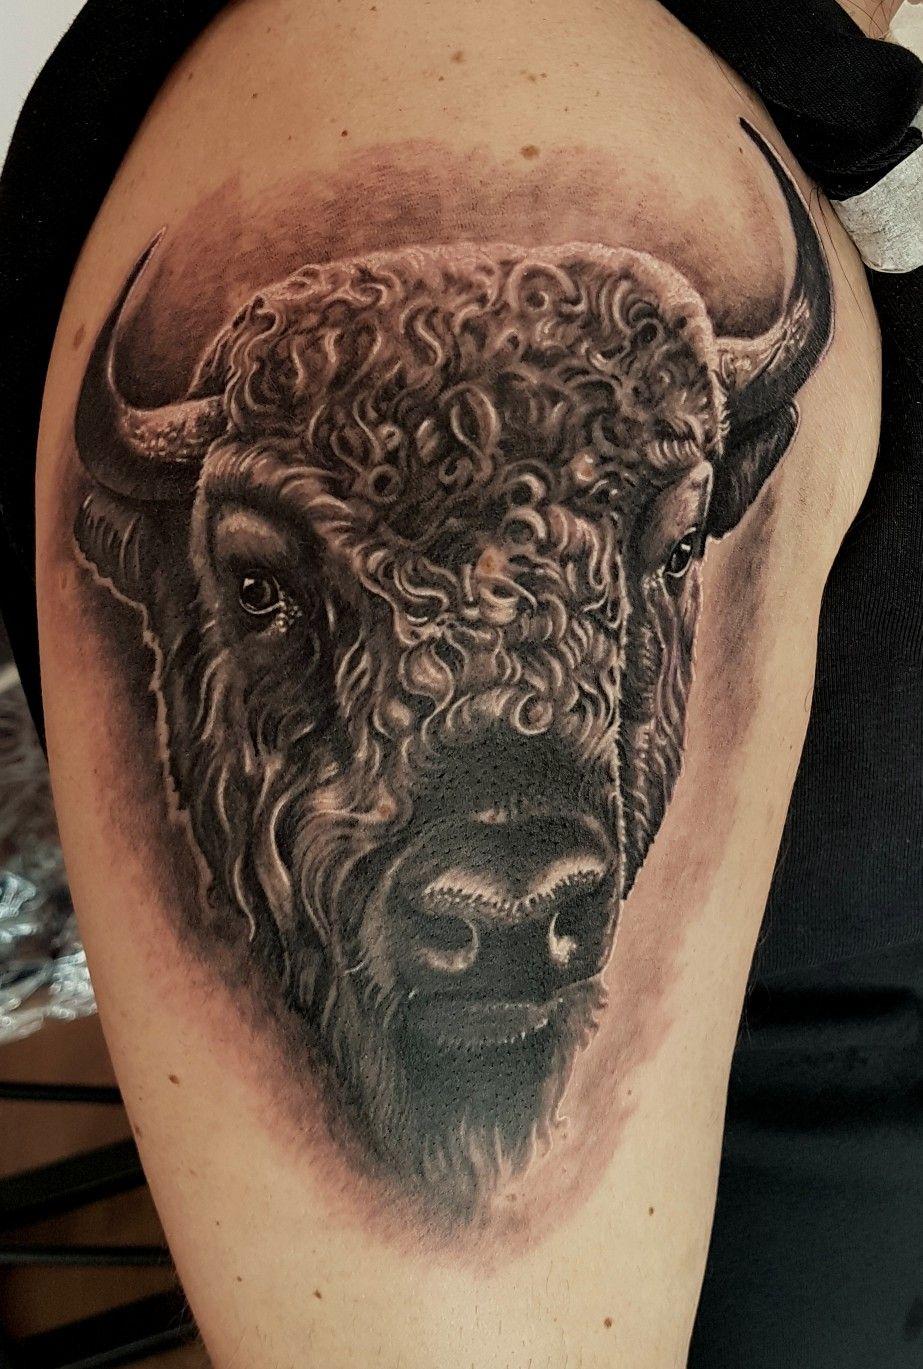 Buffalo Tattoo I Have Done A Few Weeks Ago Buffalo Tattoo Tattoos Bison Tattoo